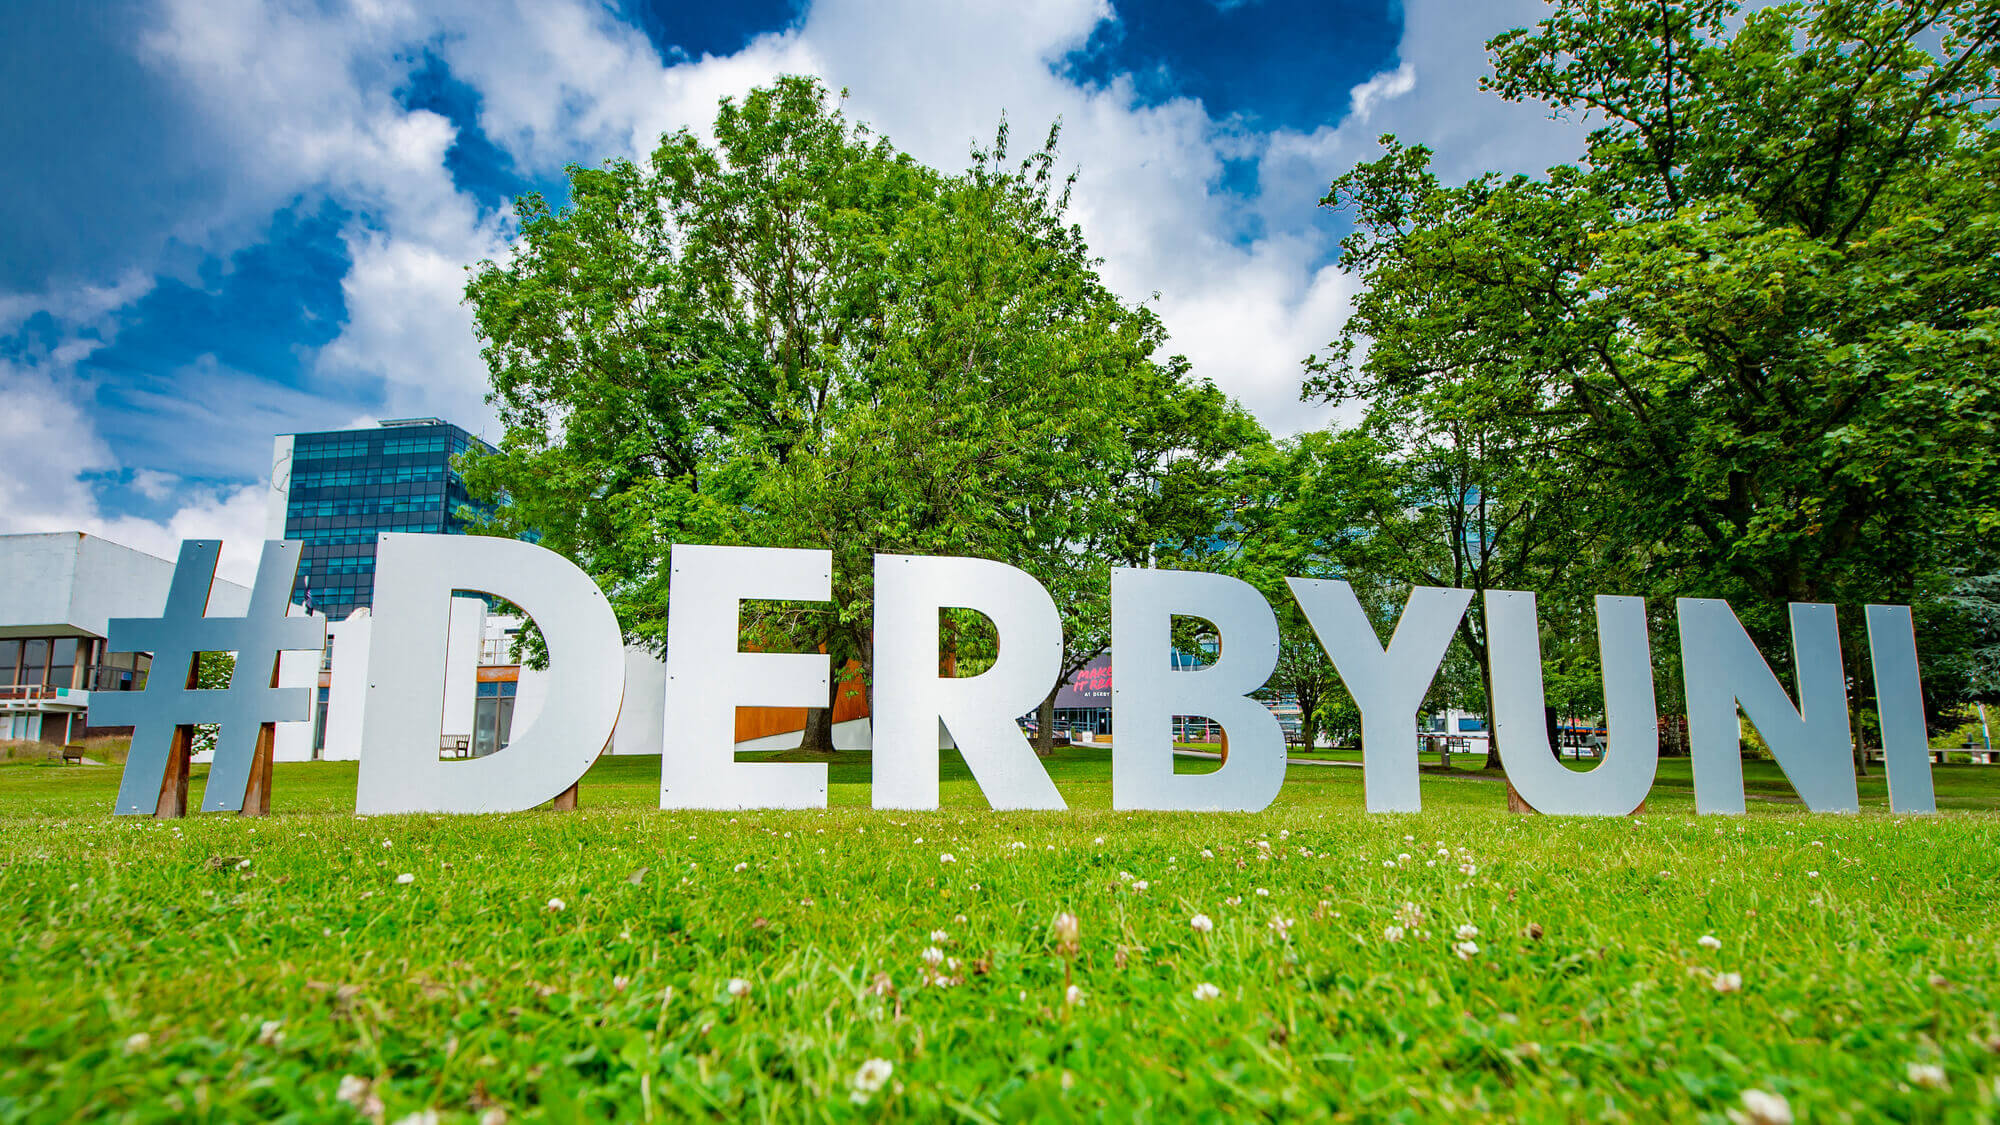 Open Days at Derby